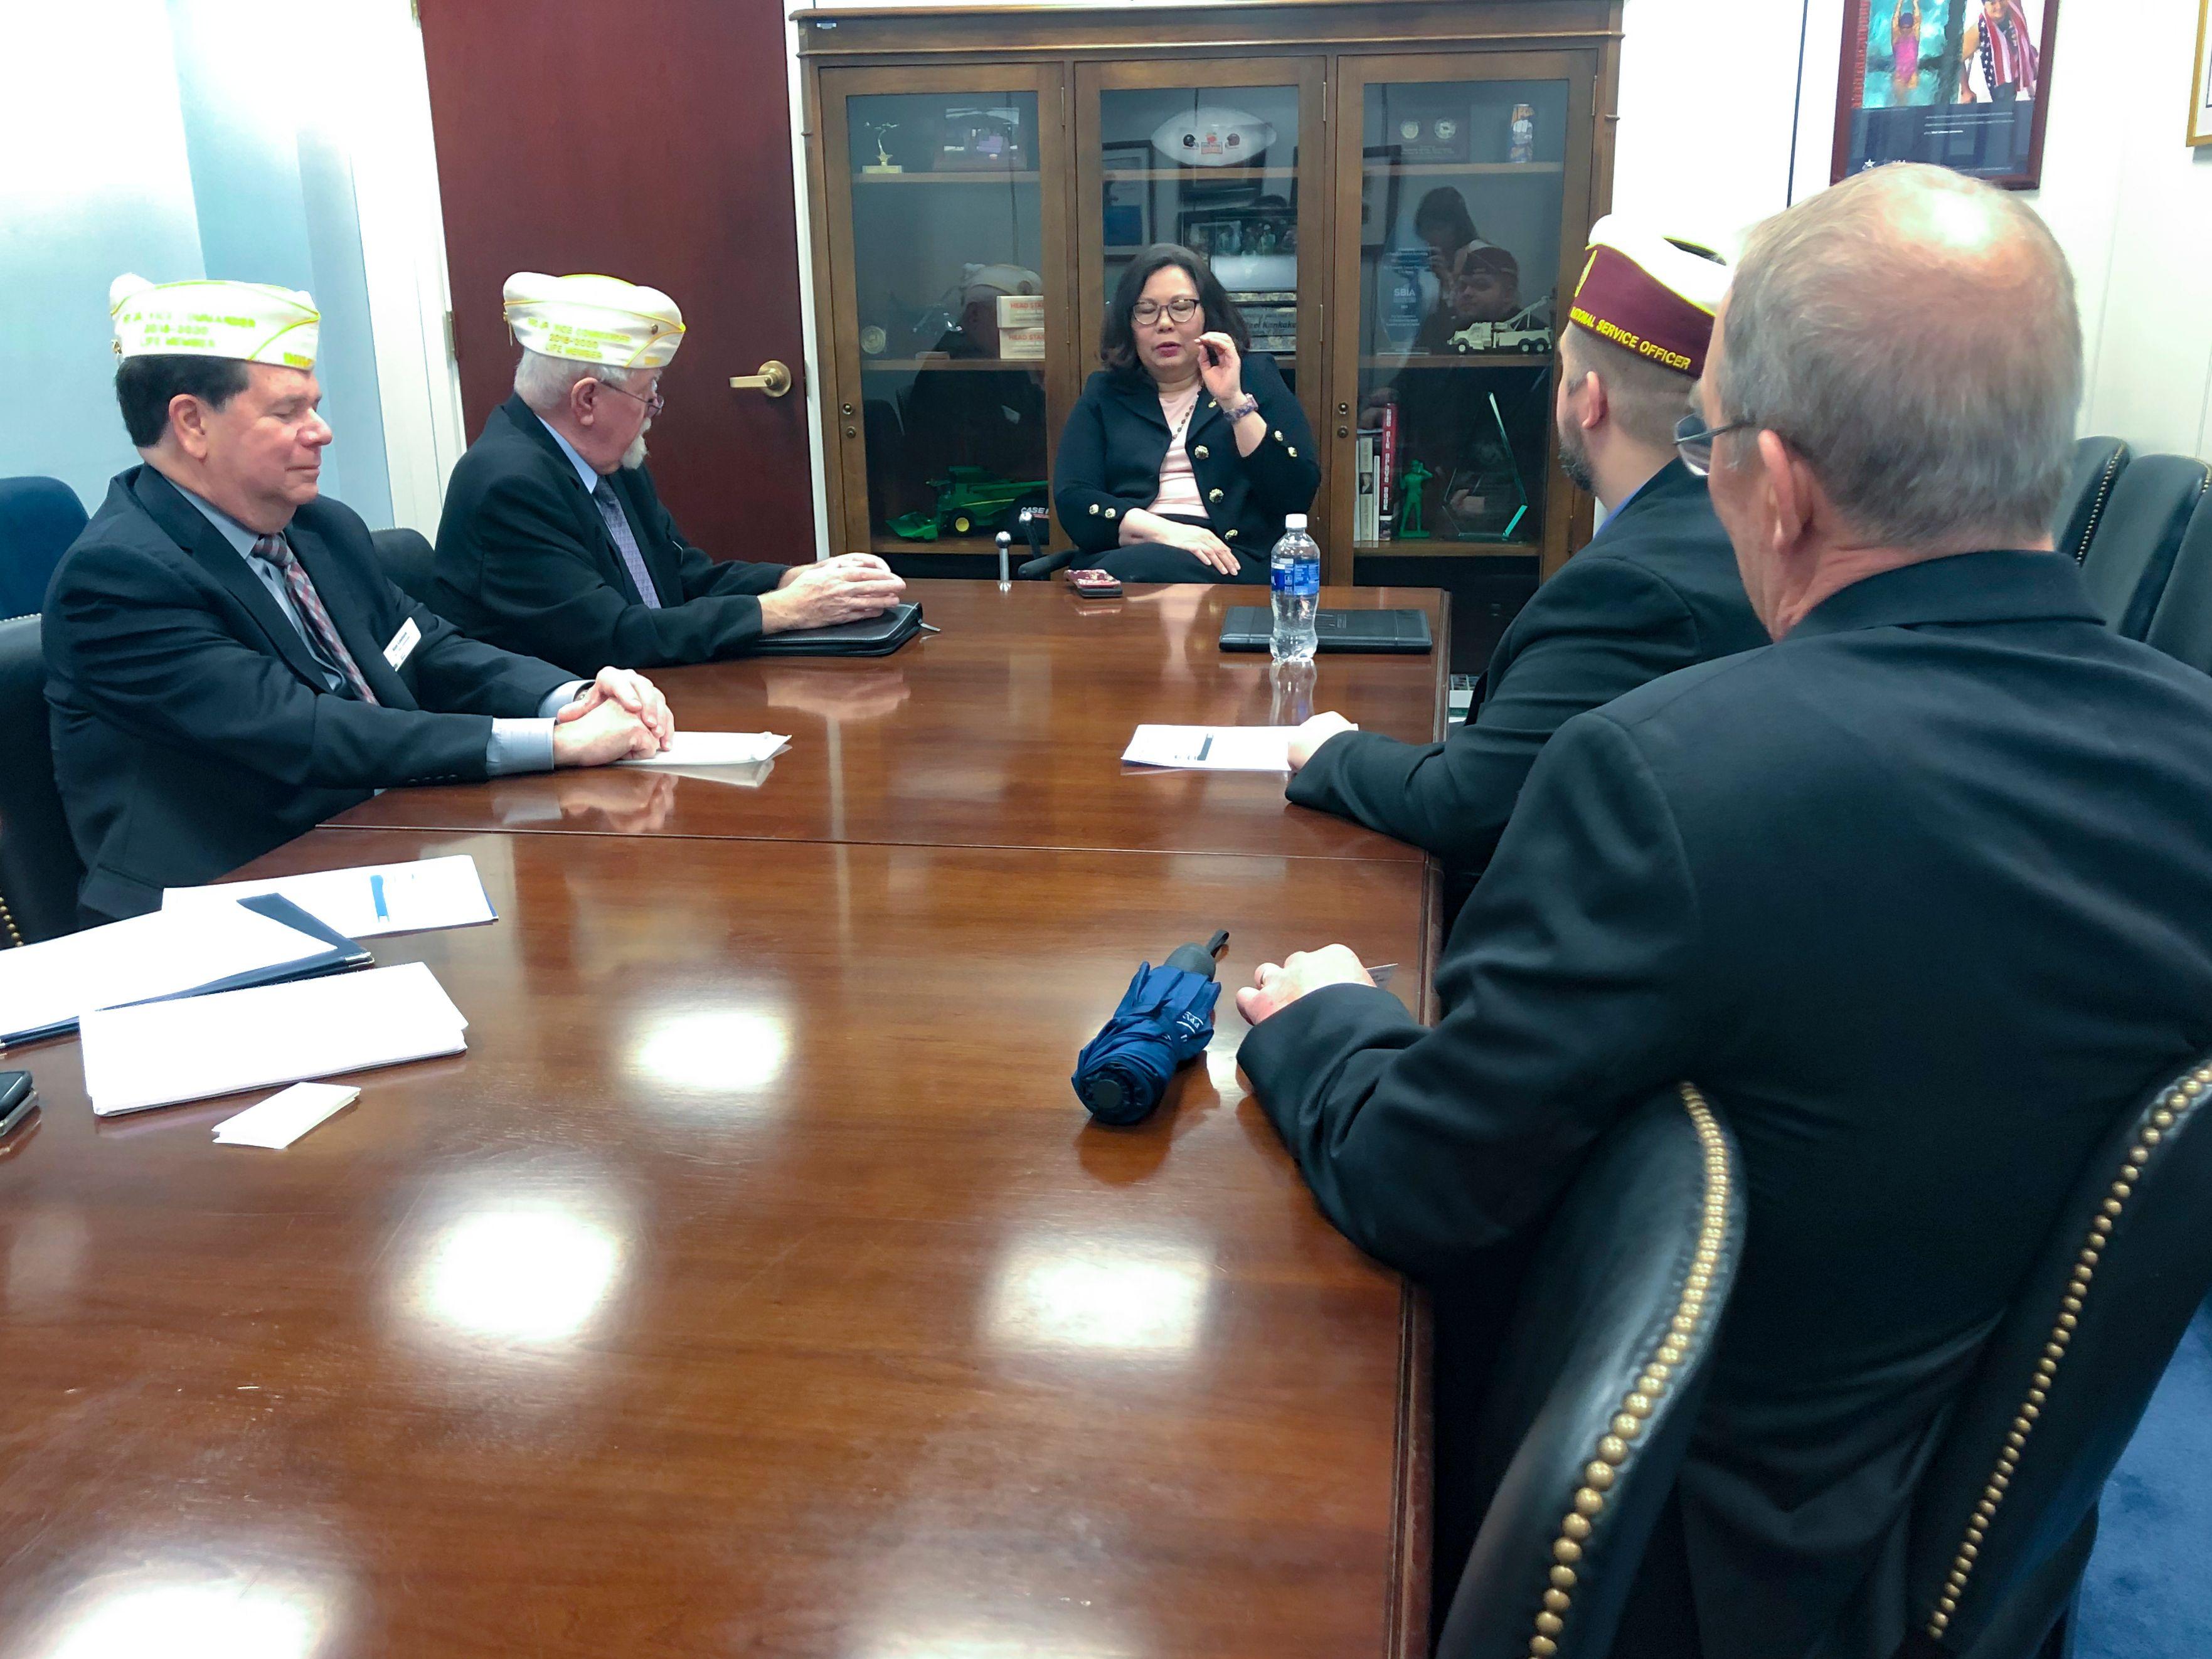 Senator meeting with DAV on legislation in a board room.